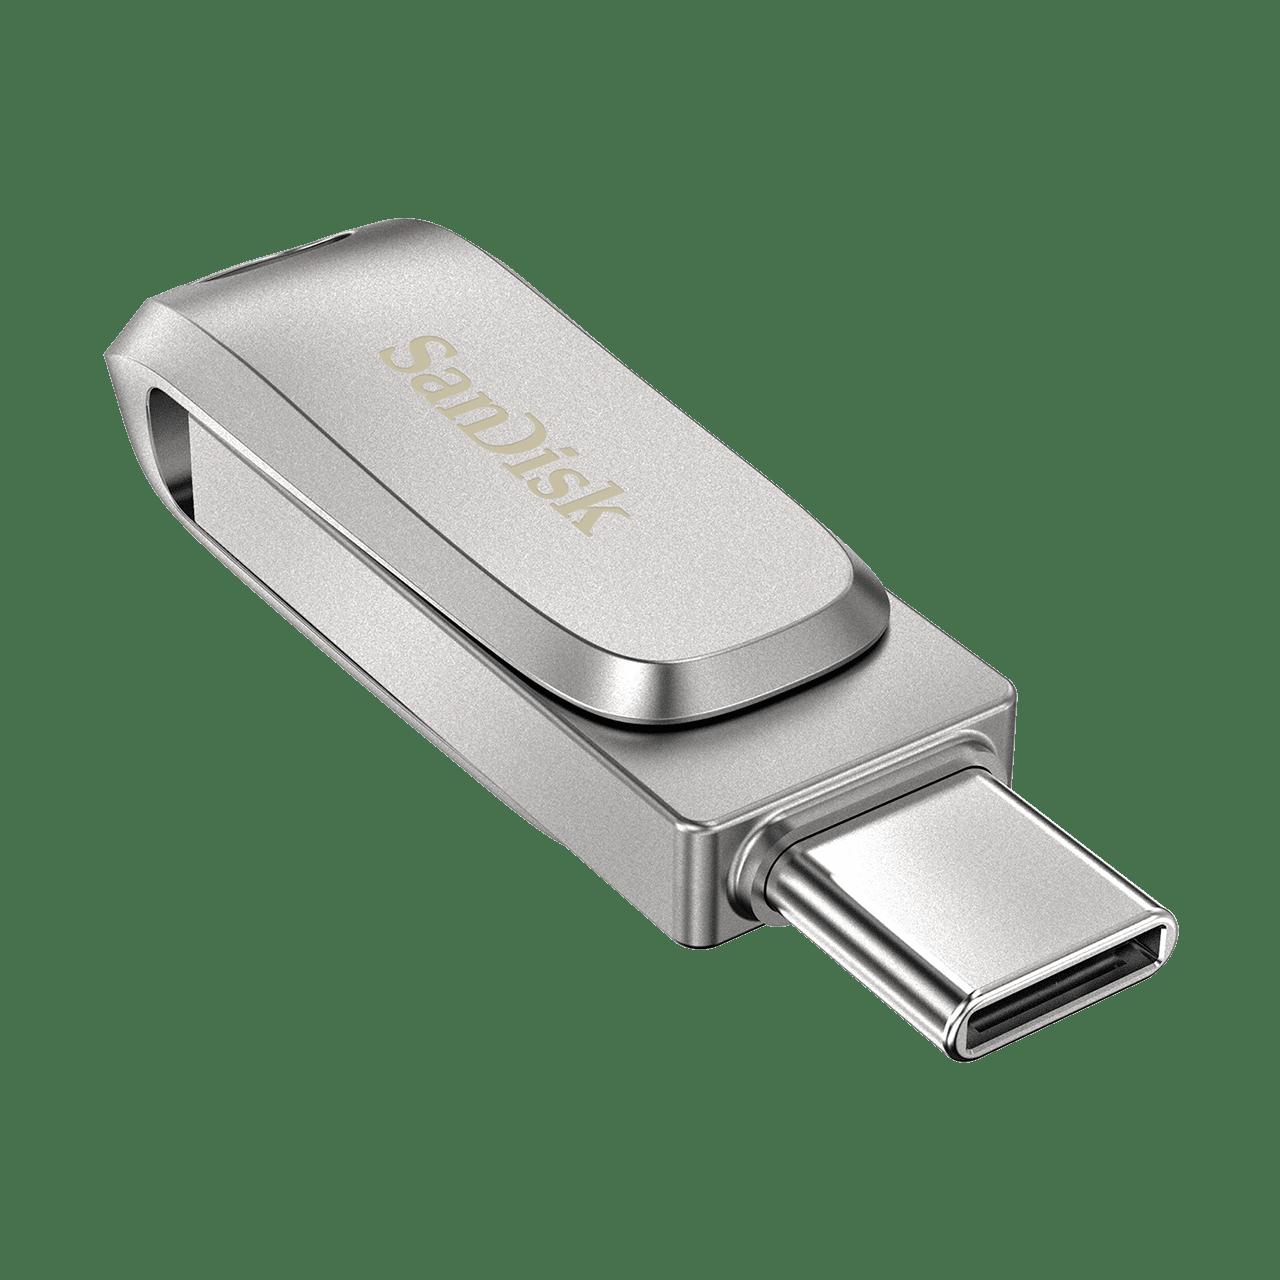 SanDisk Ultra Dual Drive Luxe USB-C 64GB - SDDDC4-064G-G46